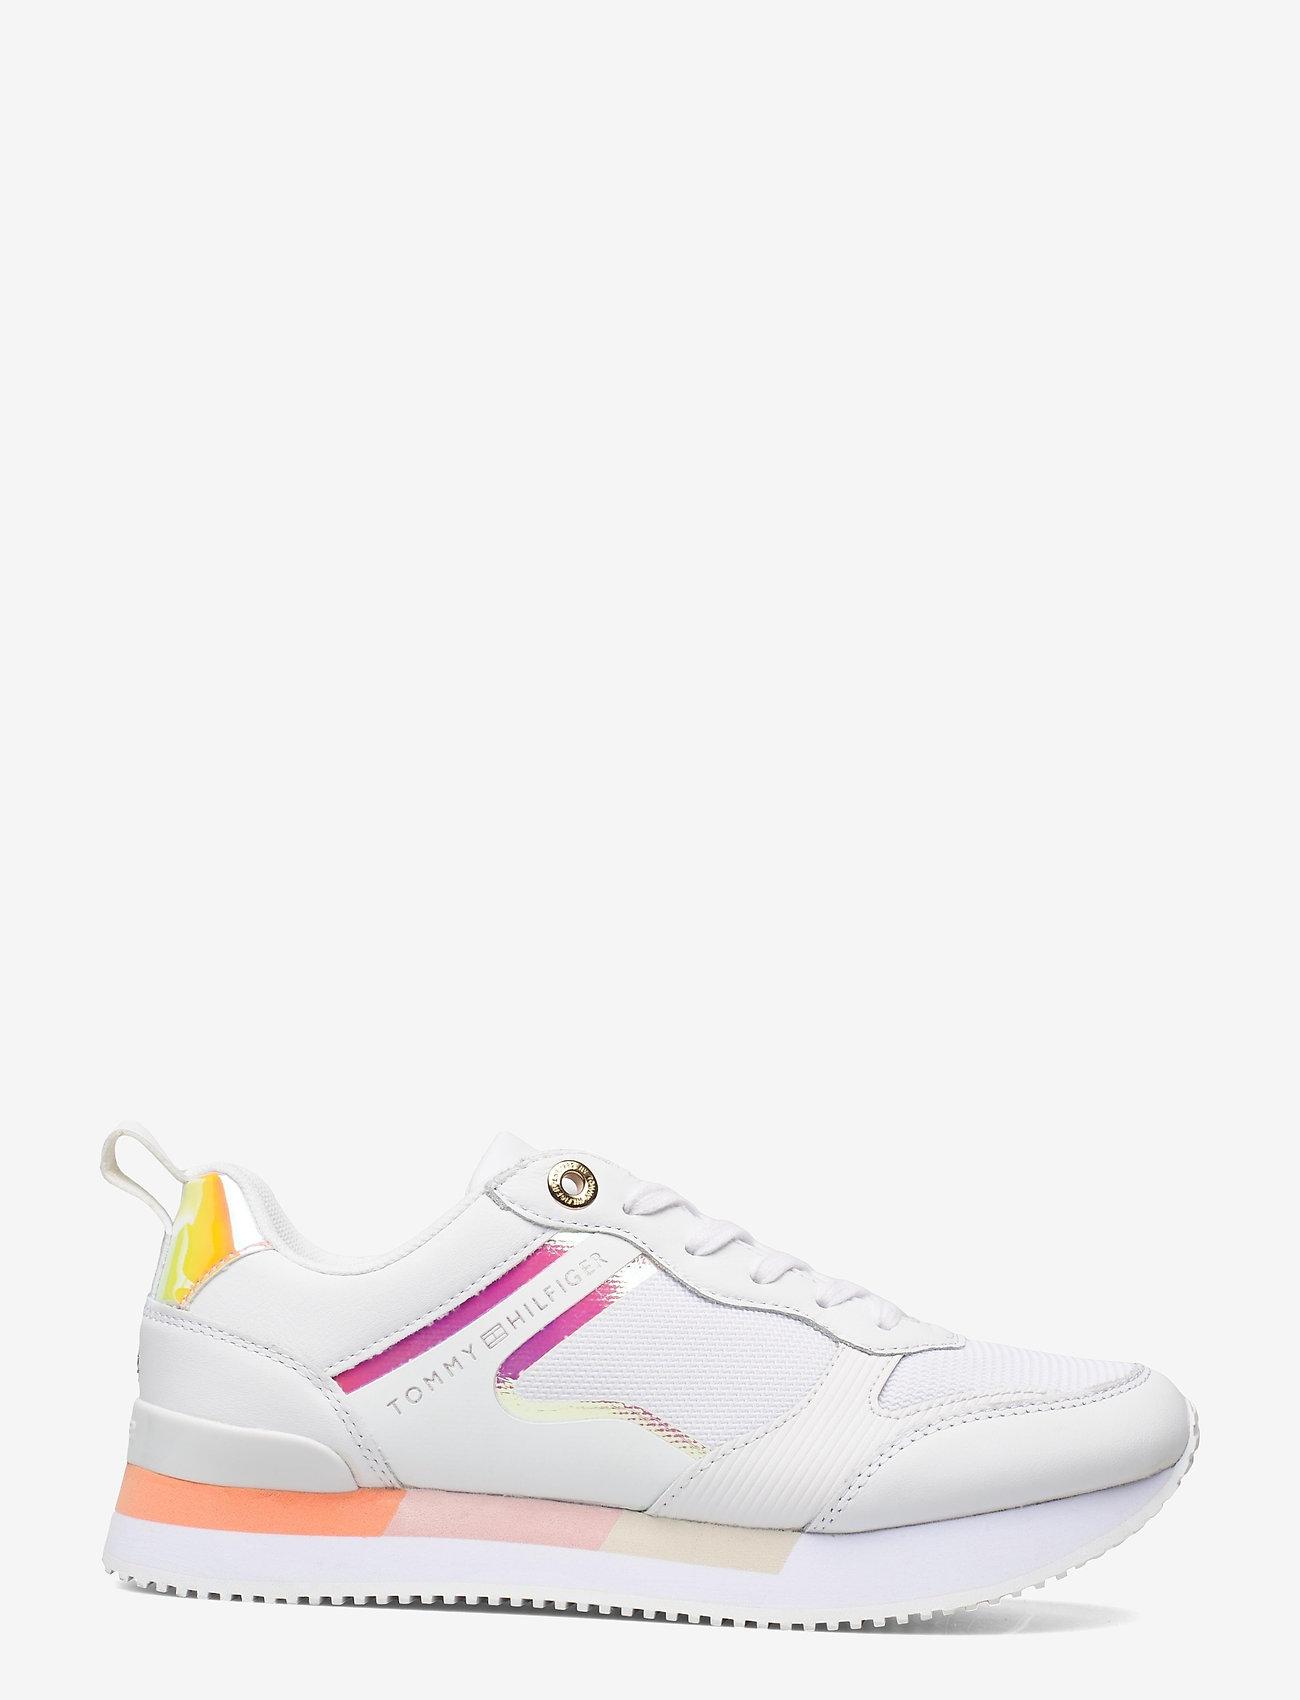 Tommy Hilfiger - FEMININE ACTIVE CITY SNEAKER - low top sneakers - light pink - 1